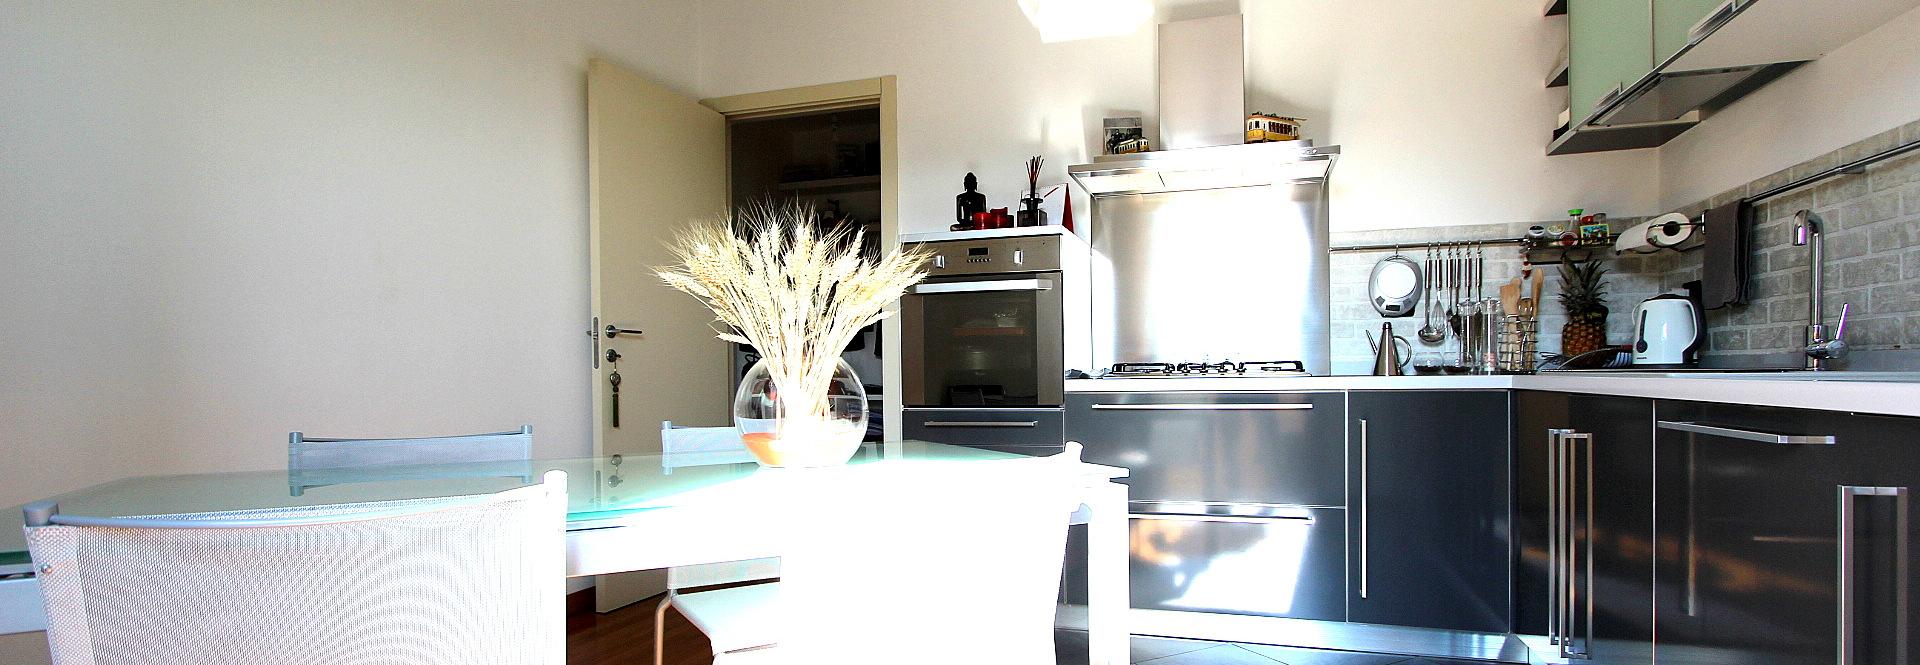 Recente e luminoso appartamento